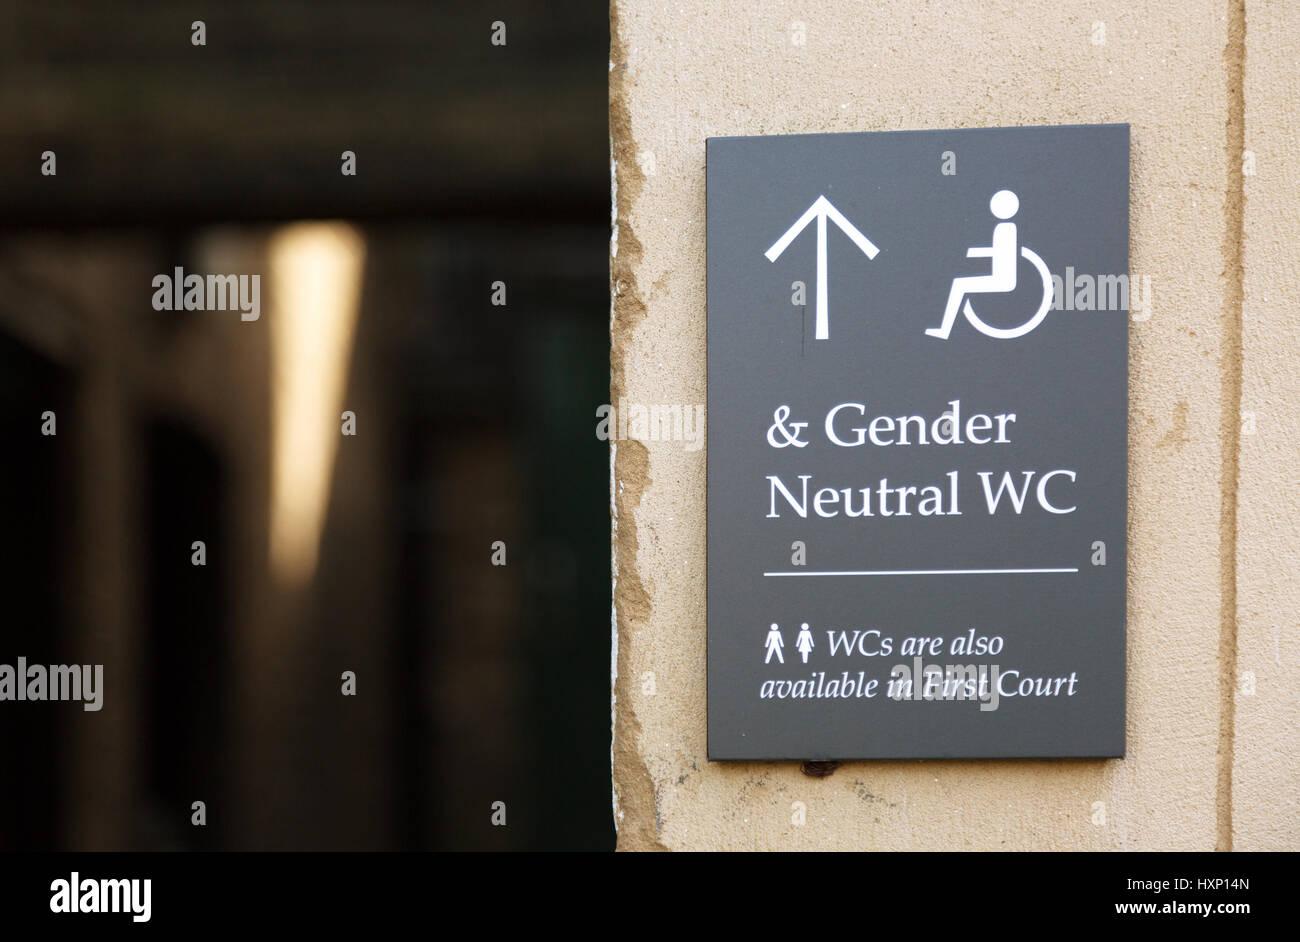 Gender Neutral WC sign, Cambridge England UK - Stock Image